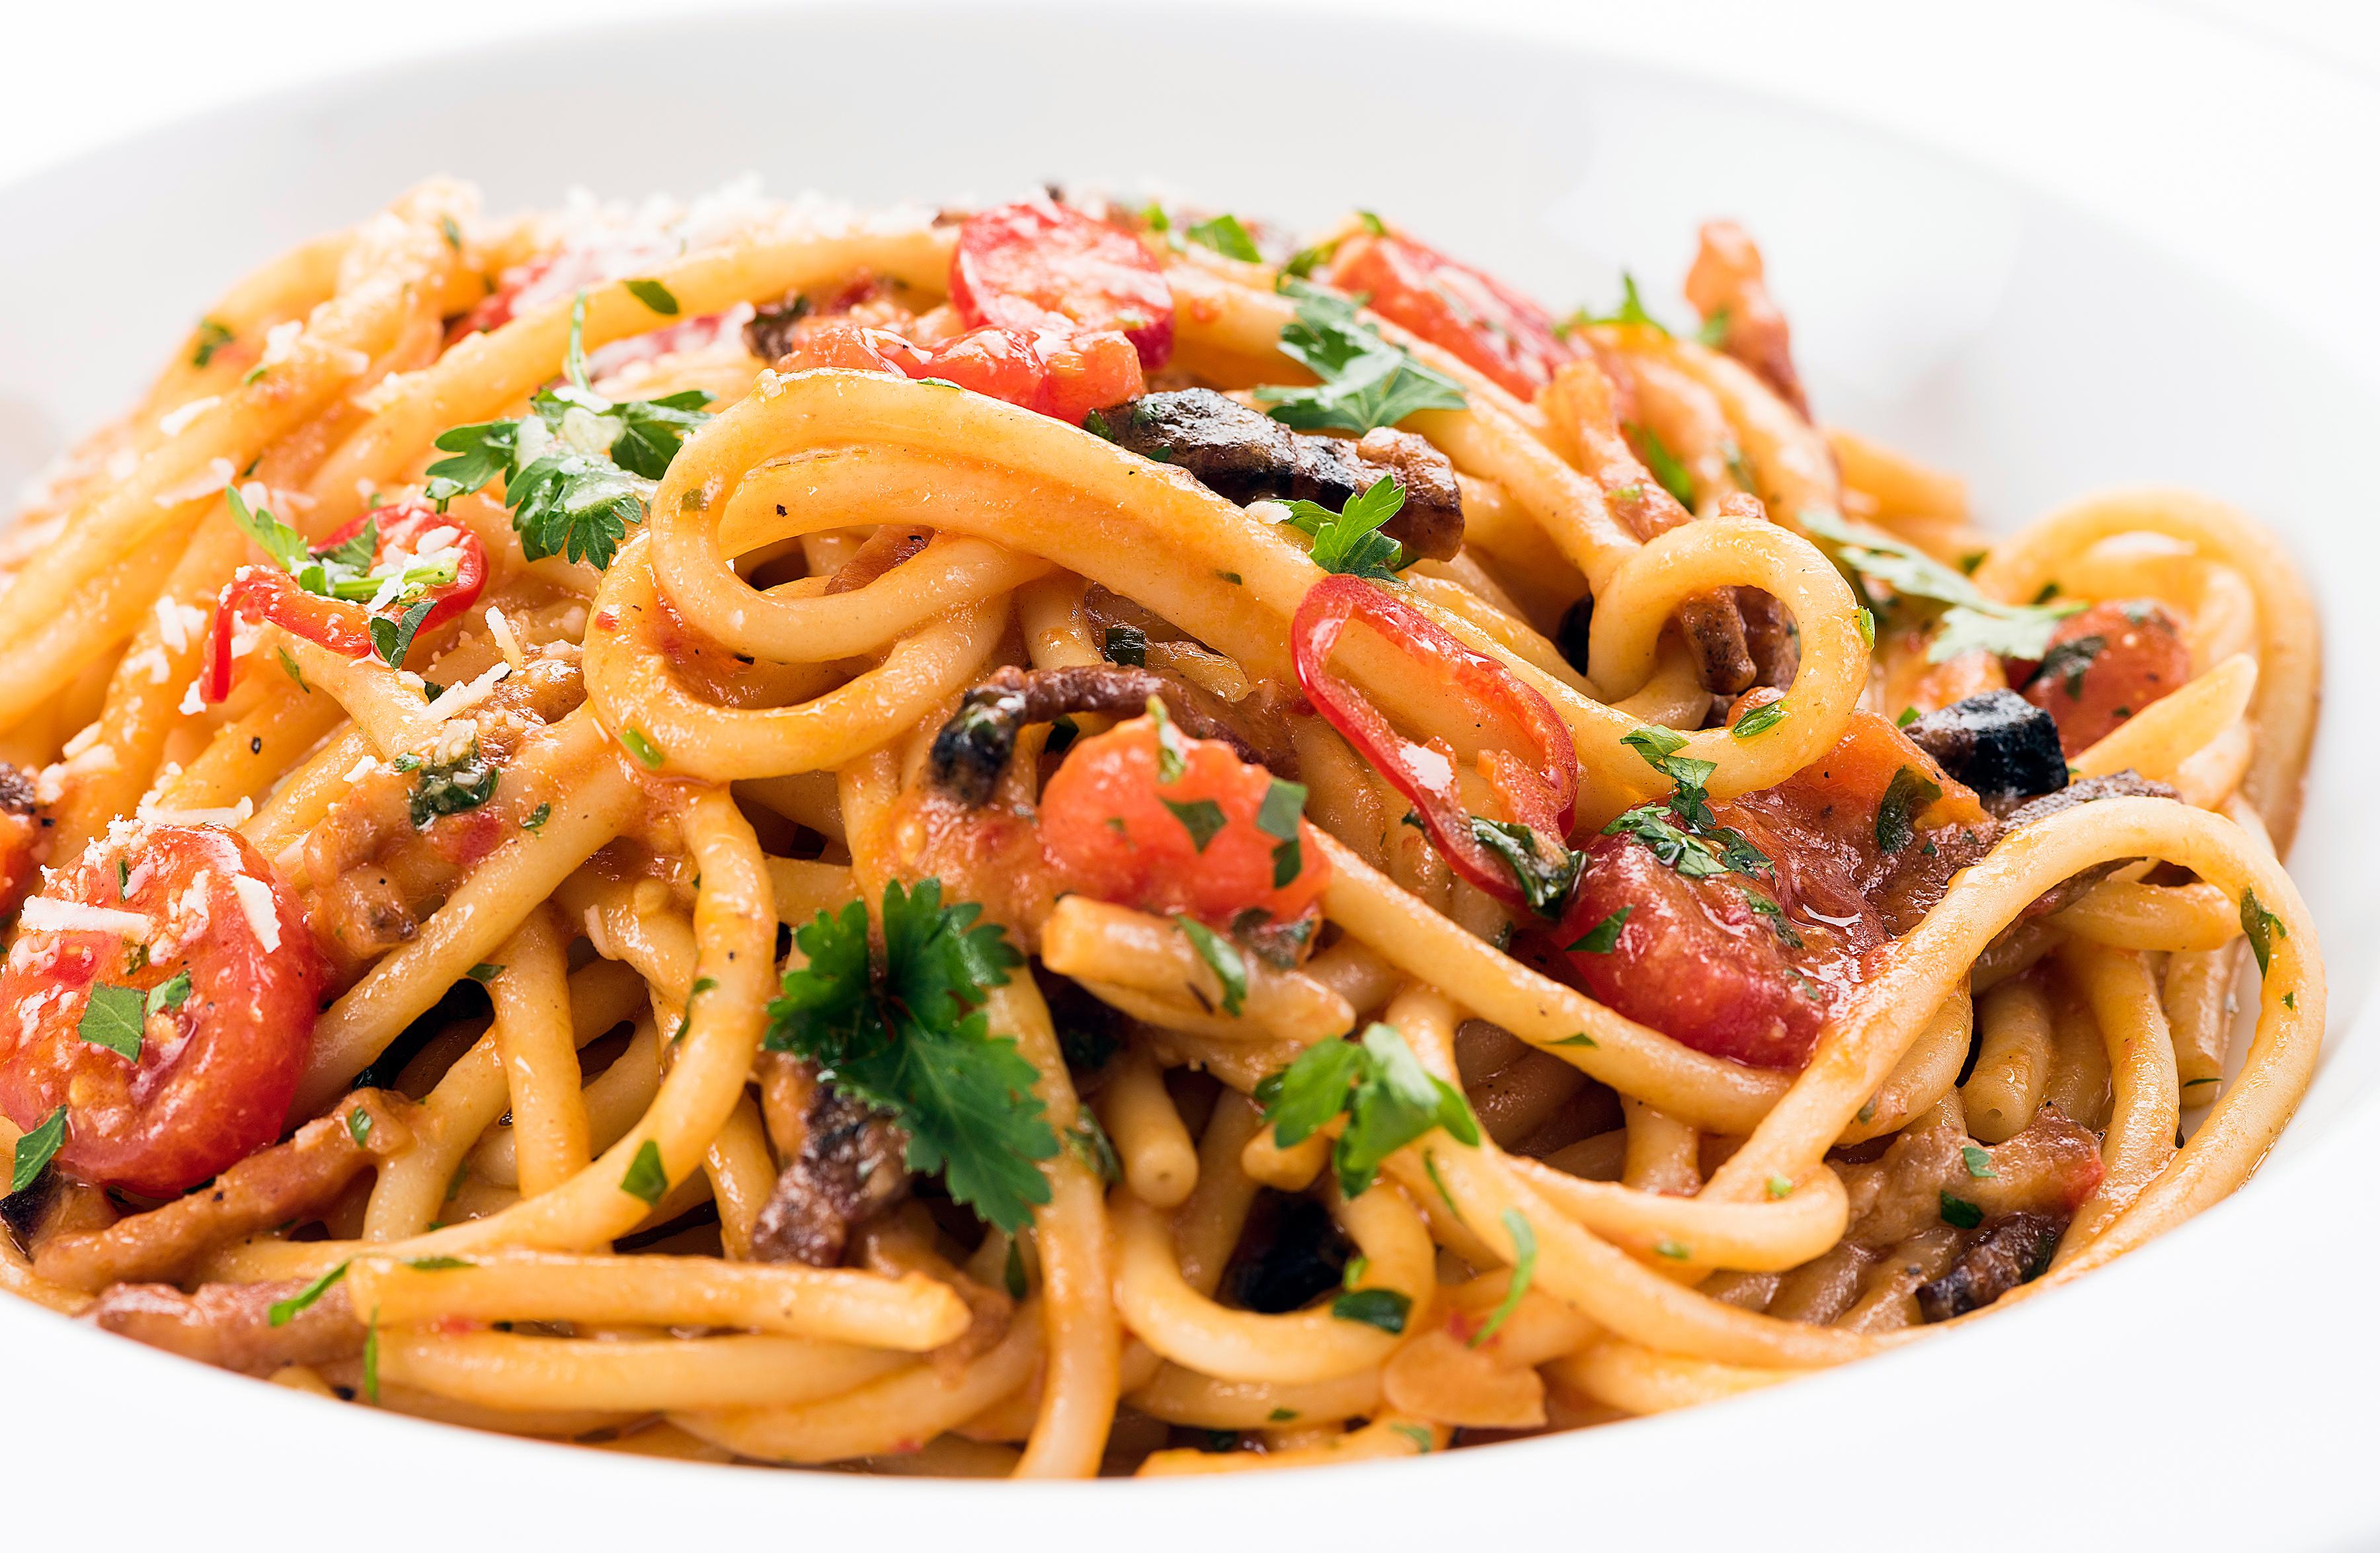 Pasta dish photo